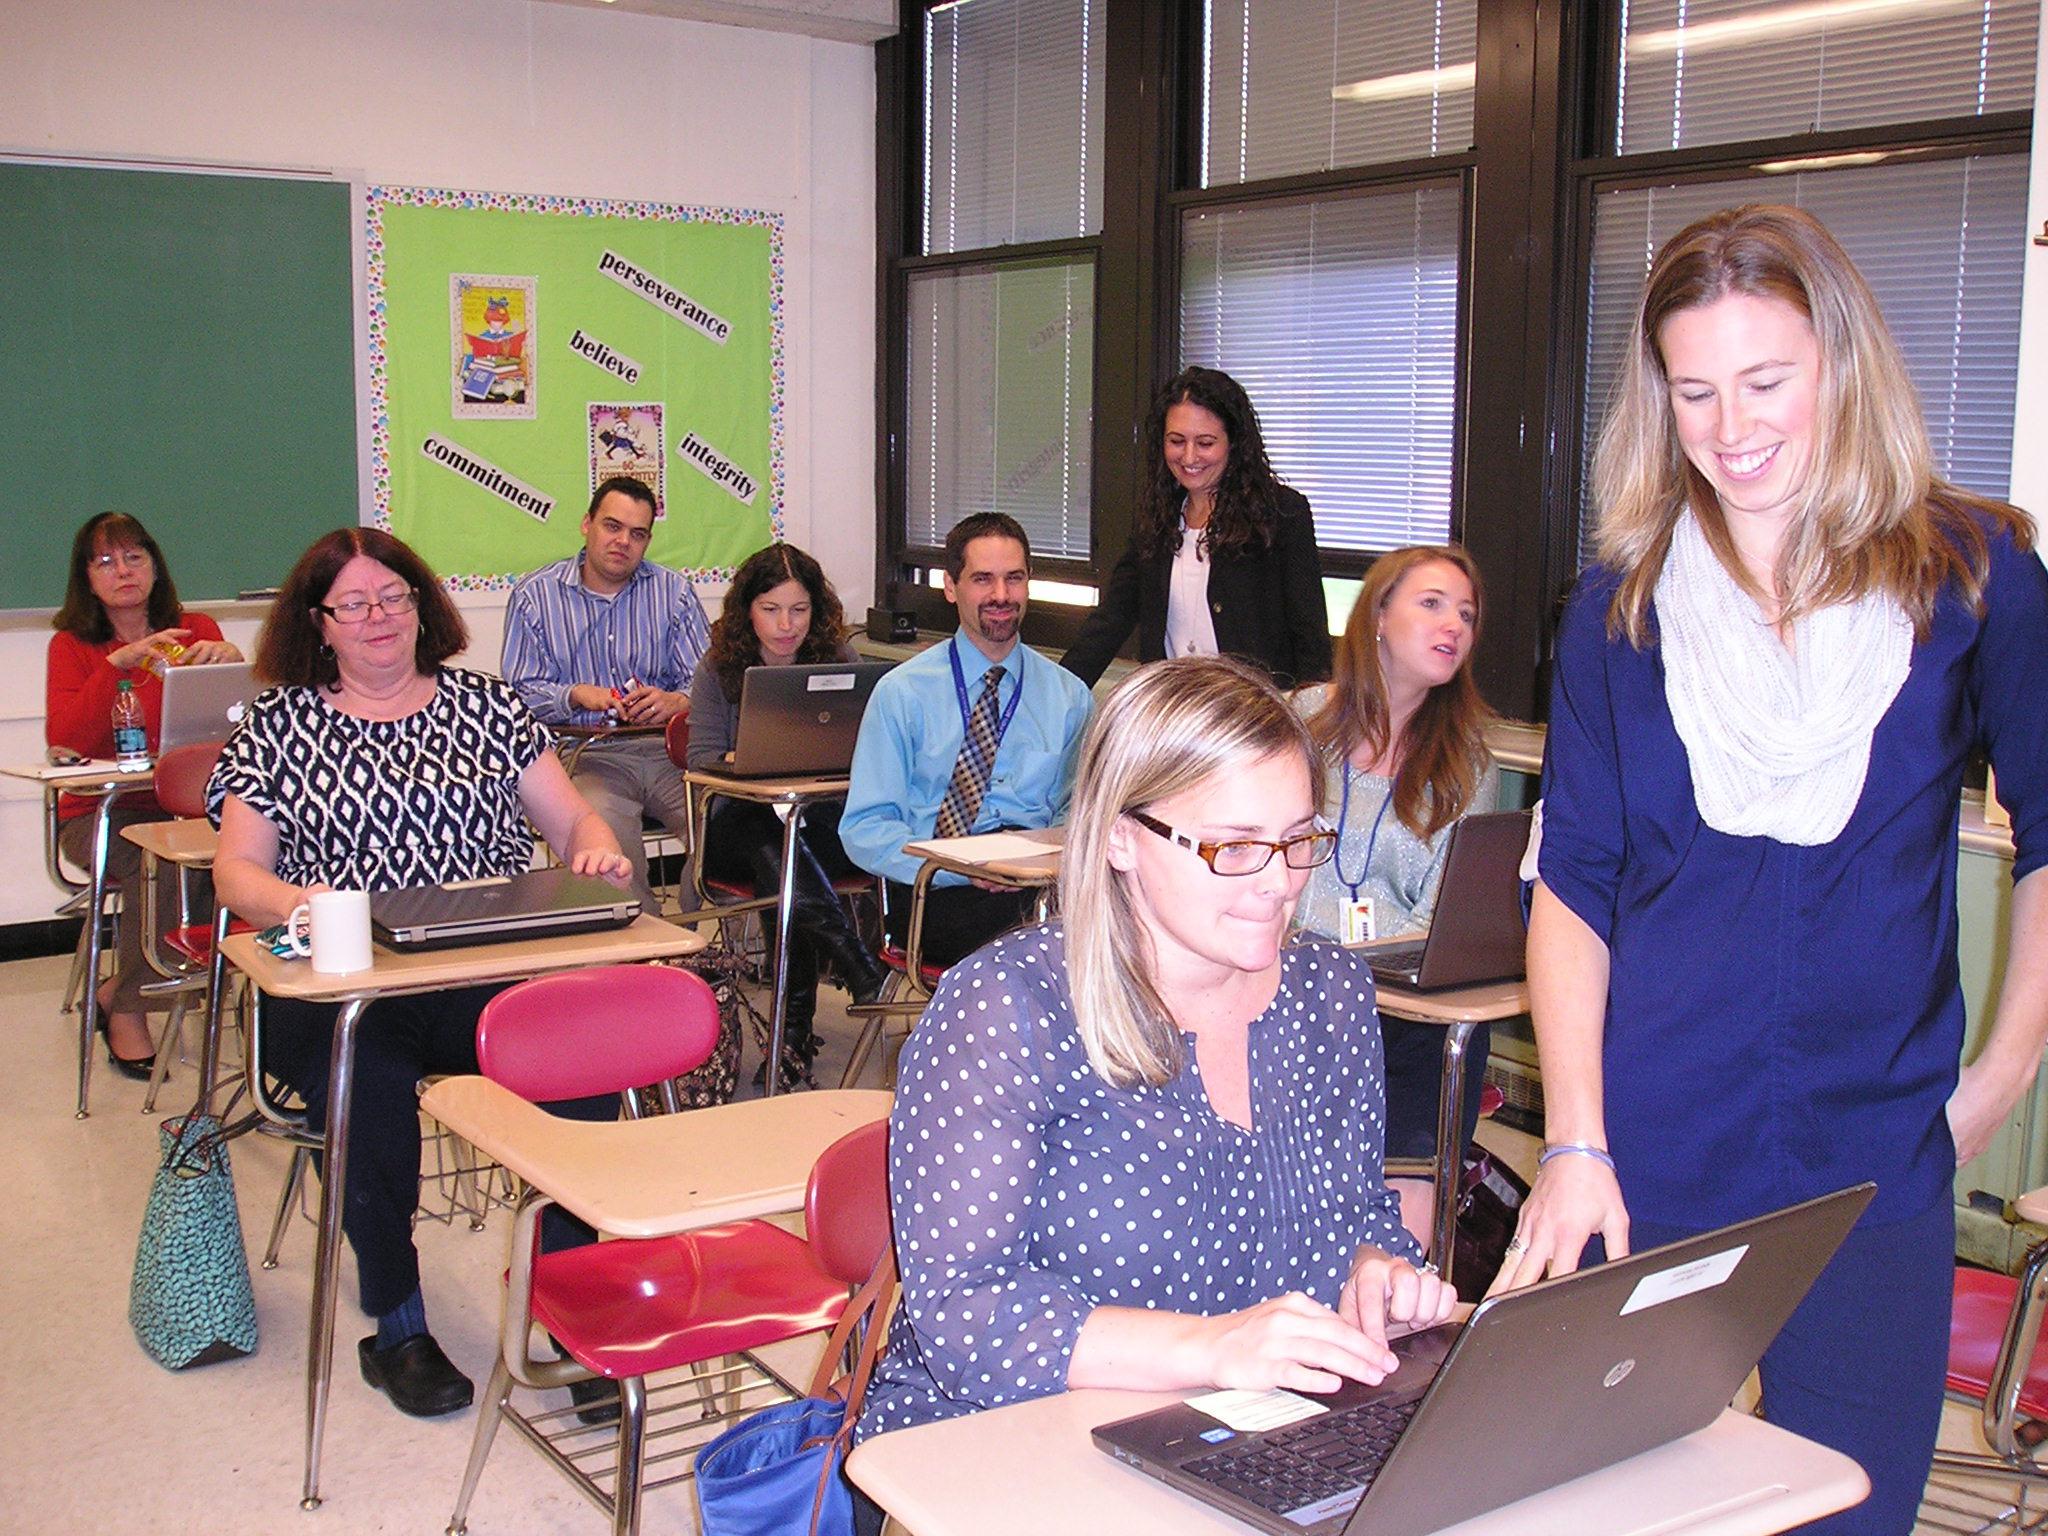 2ad7e429842562ab9b82_Math_teachers_engage_in_technology.JPG